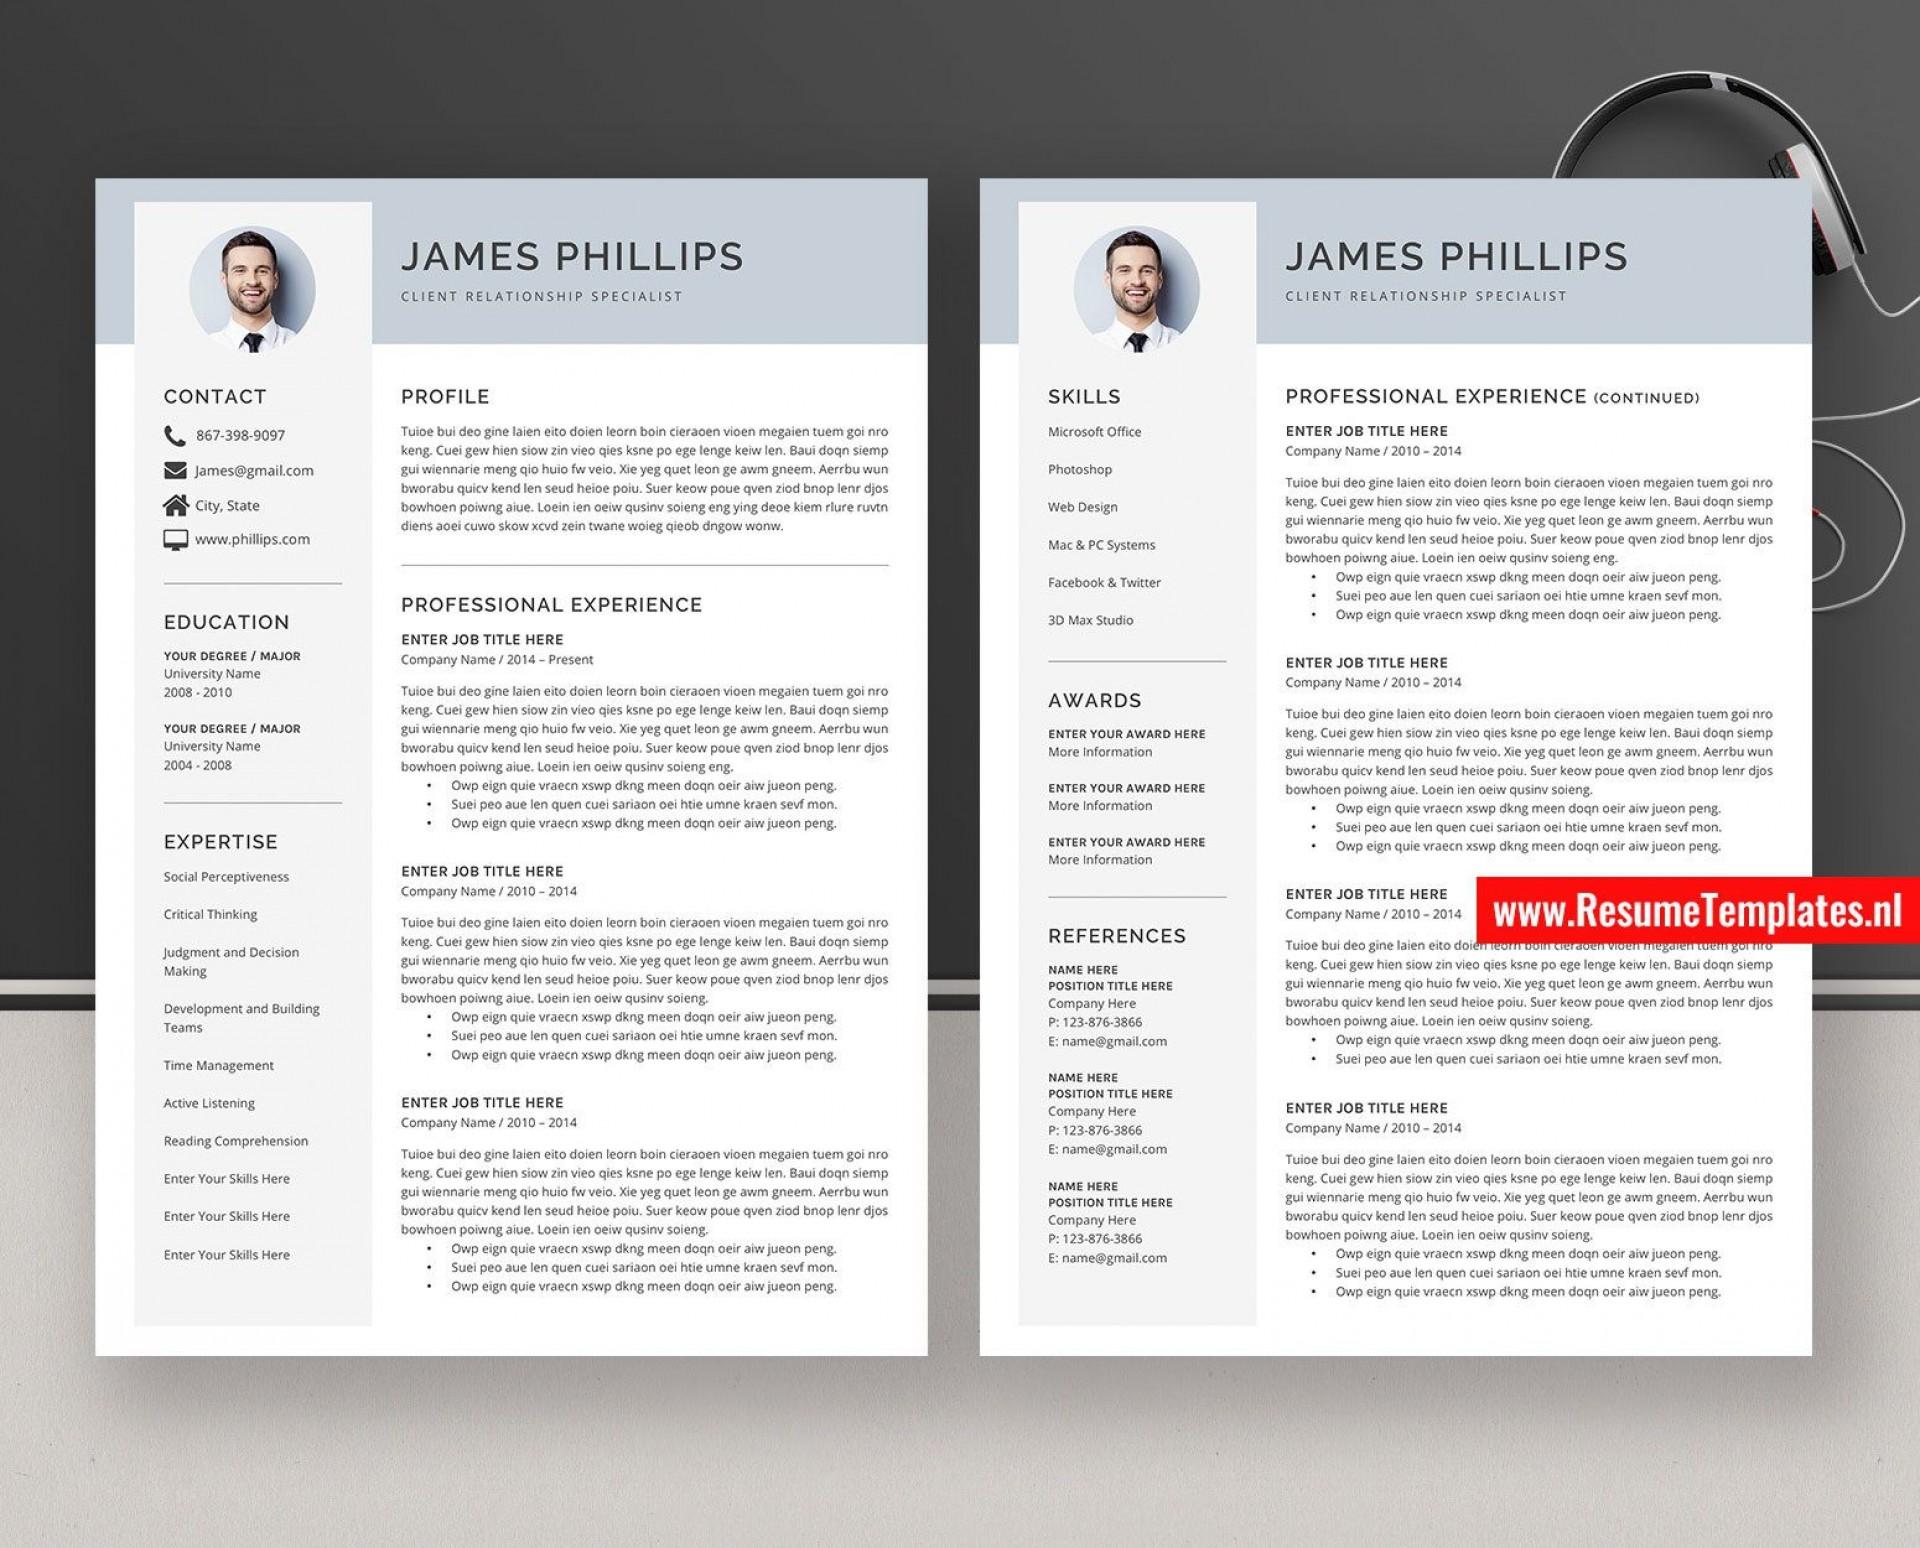 008 Simple Resume Template On Microsoft Word Photo  Sample 2007 Cv 20101920